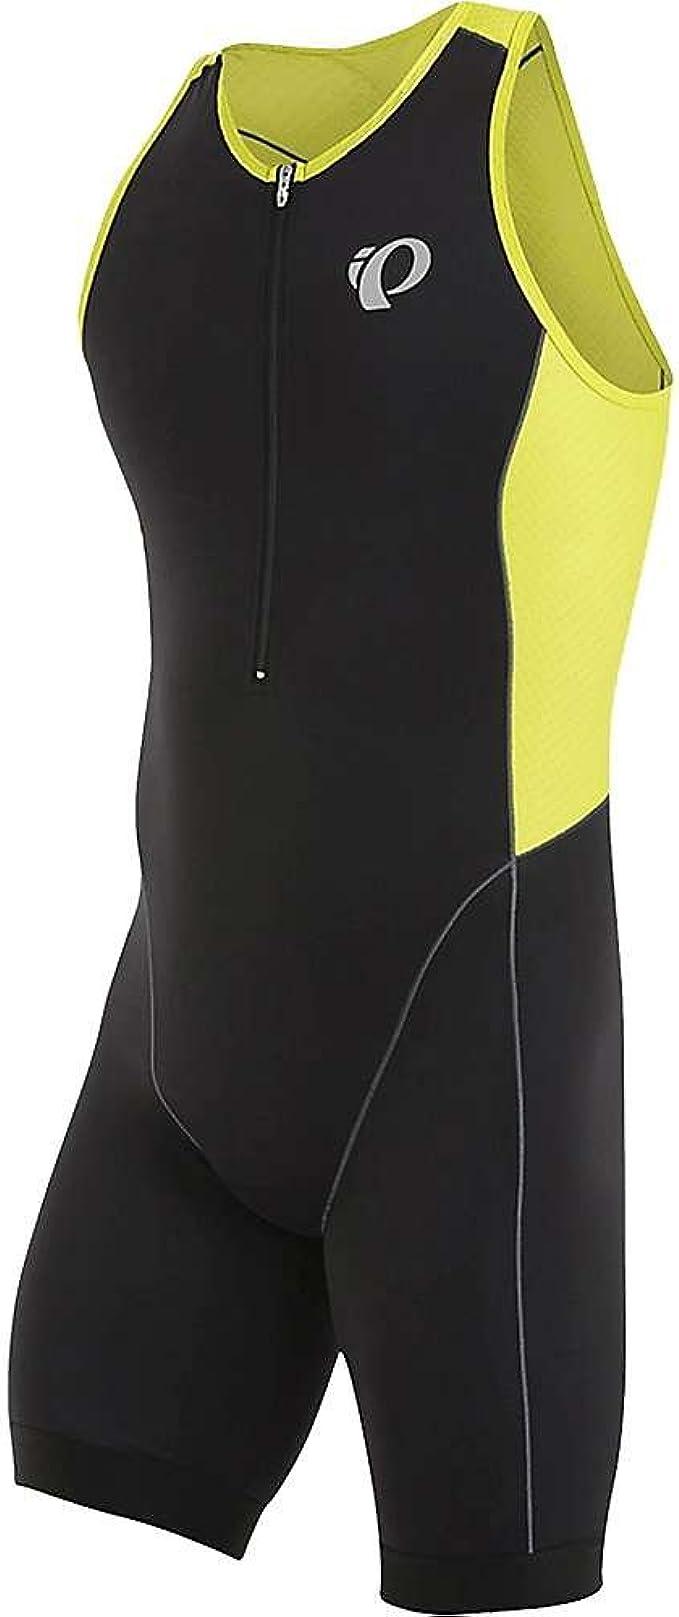 "Pearl Izumi 13111901 Men/'s Elite graphique Tri Court 9/"" /""entrejambe Triathlon Cyclisme"